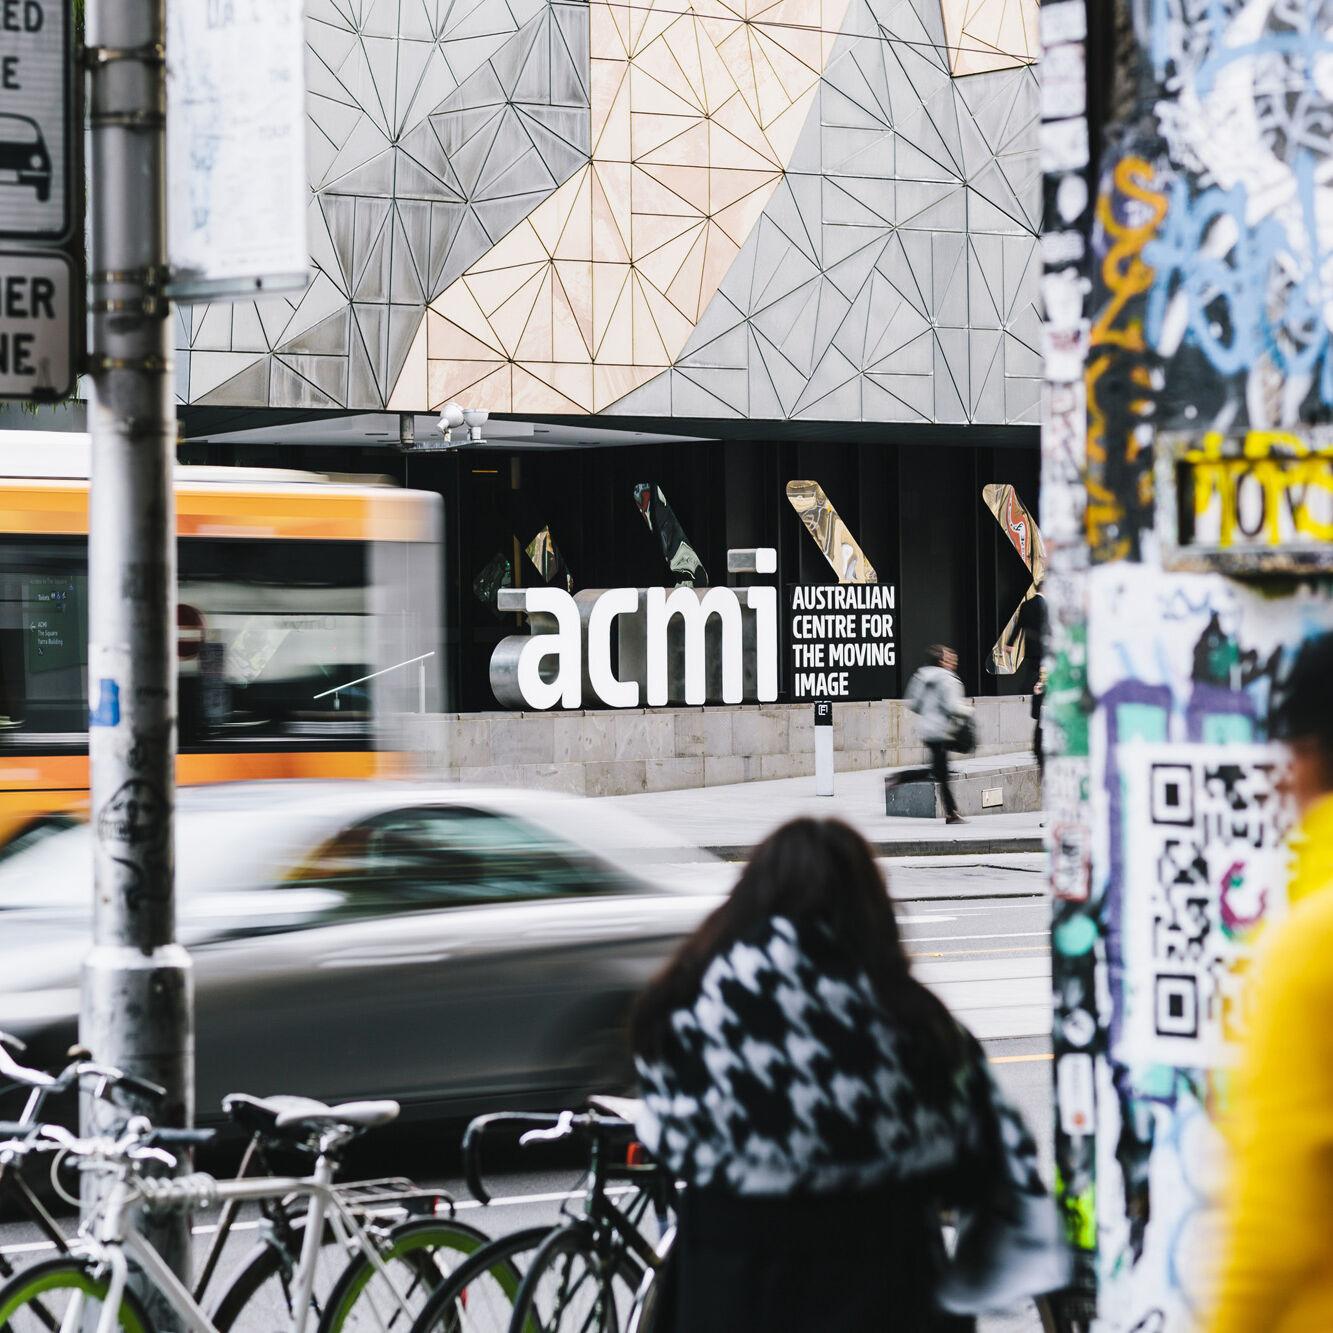 GALLERY ACMI RENEE STAMATIS PHOTOGRAPHY 2017